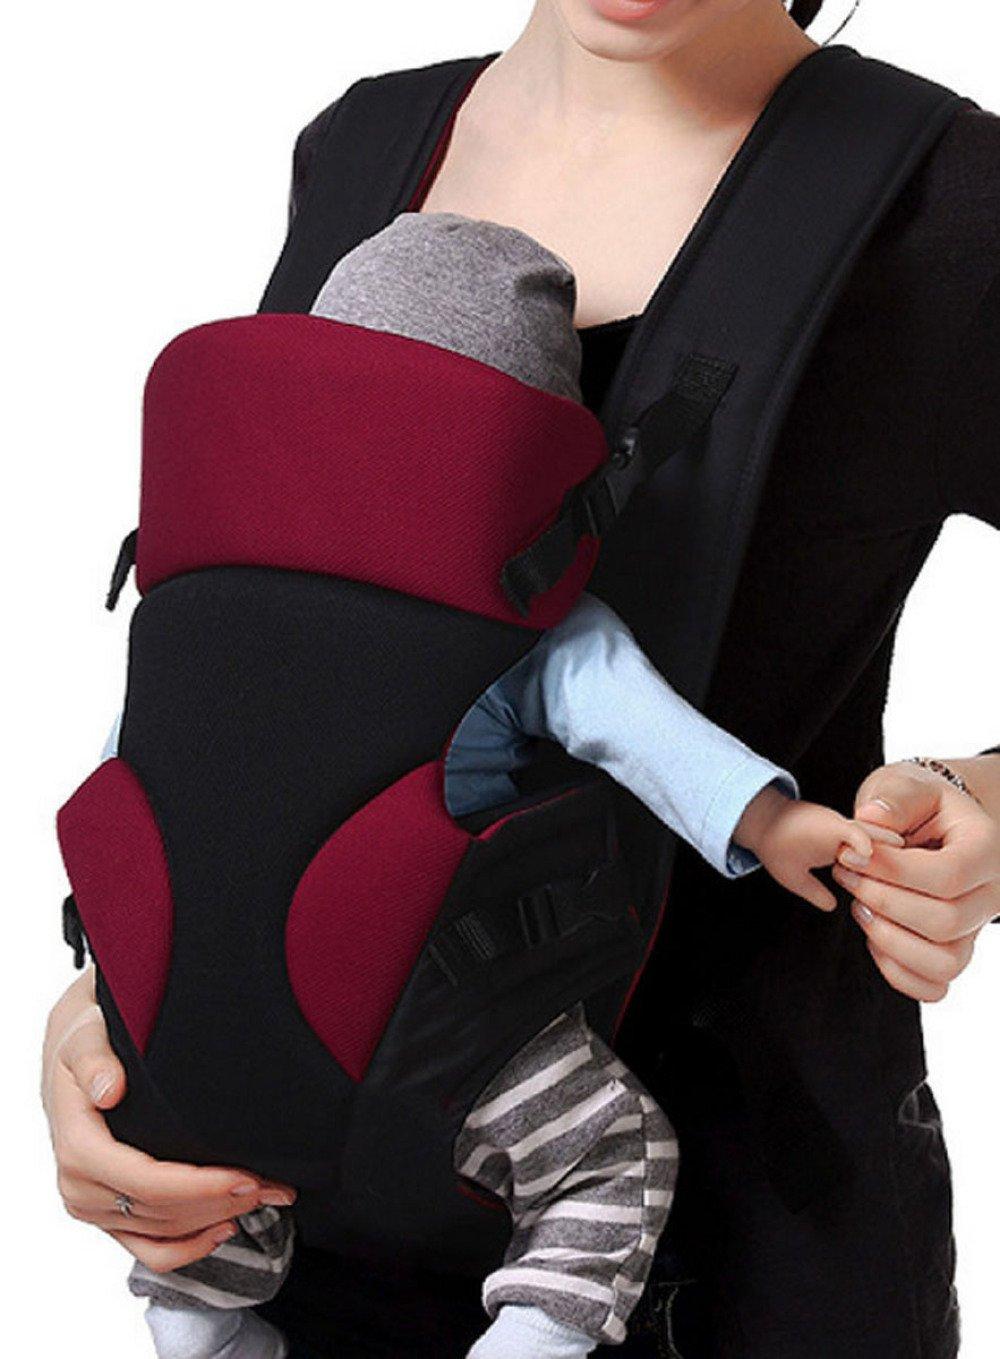 TUJHGF Schulter Baby Hosenträger Vier Jahreszeiten Universal Frontklemme Multifunktional Atmungsaktiv Gürtel,2